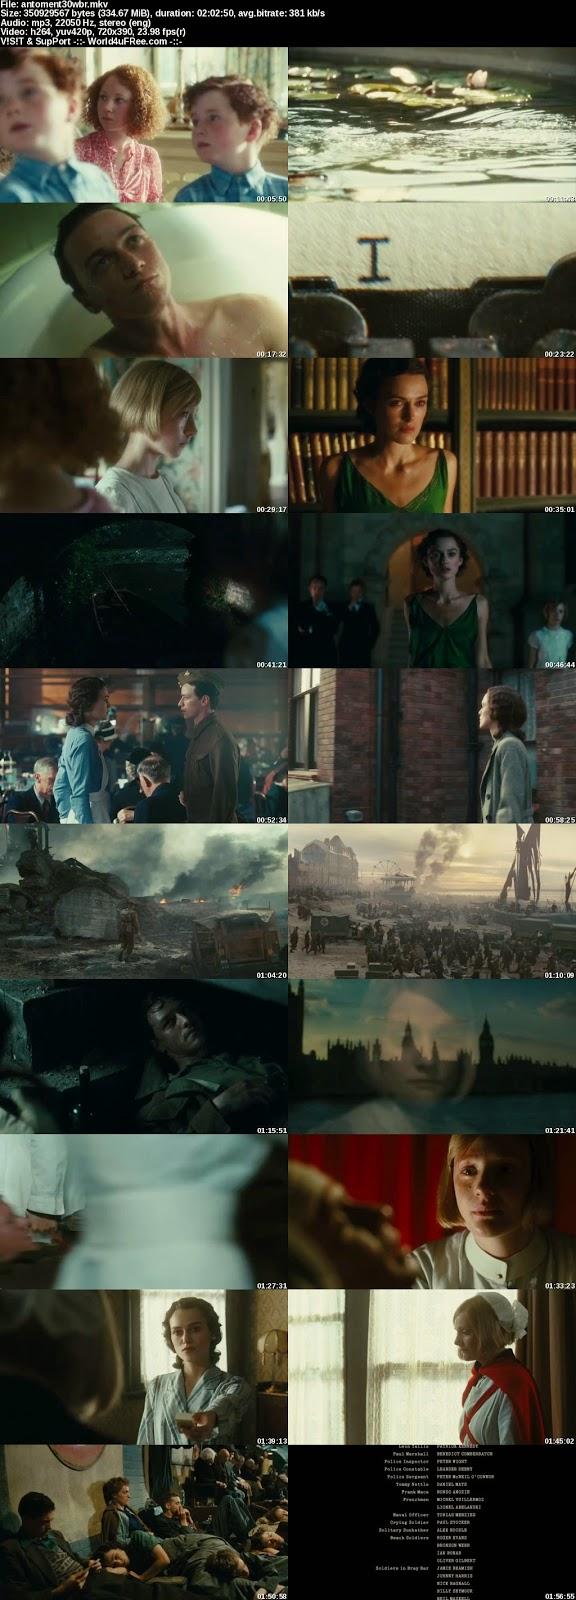 Atonement (2007) English 480p BluRay 500Mb Full Movie Download